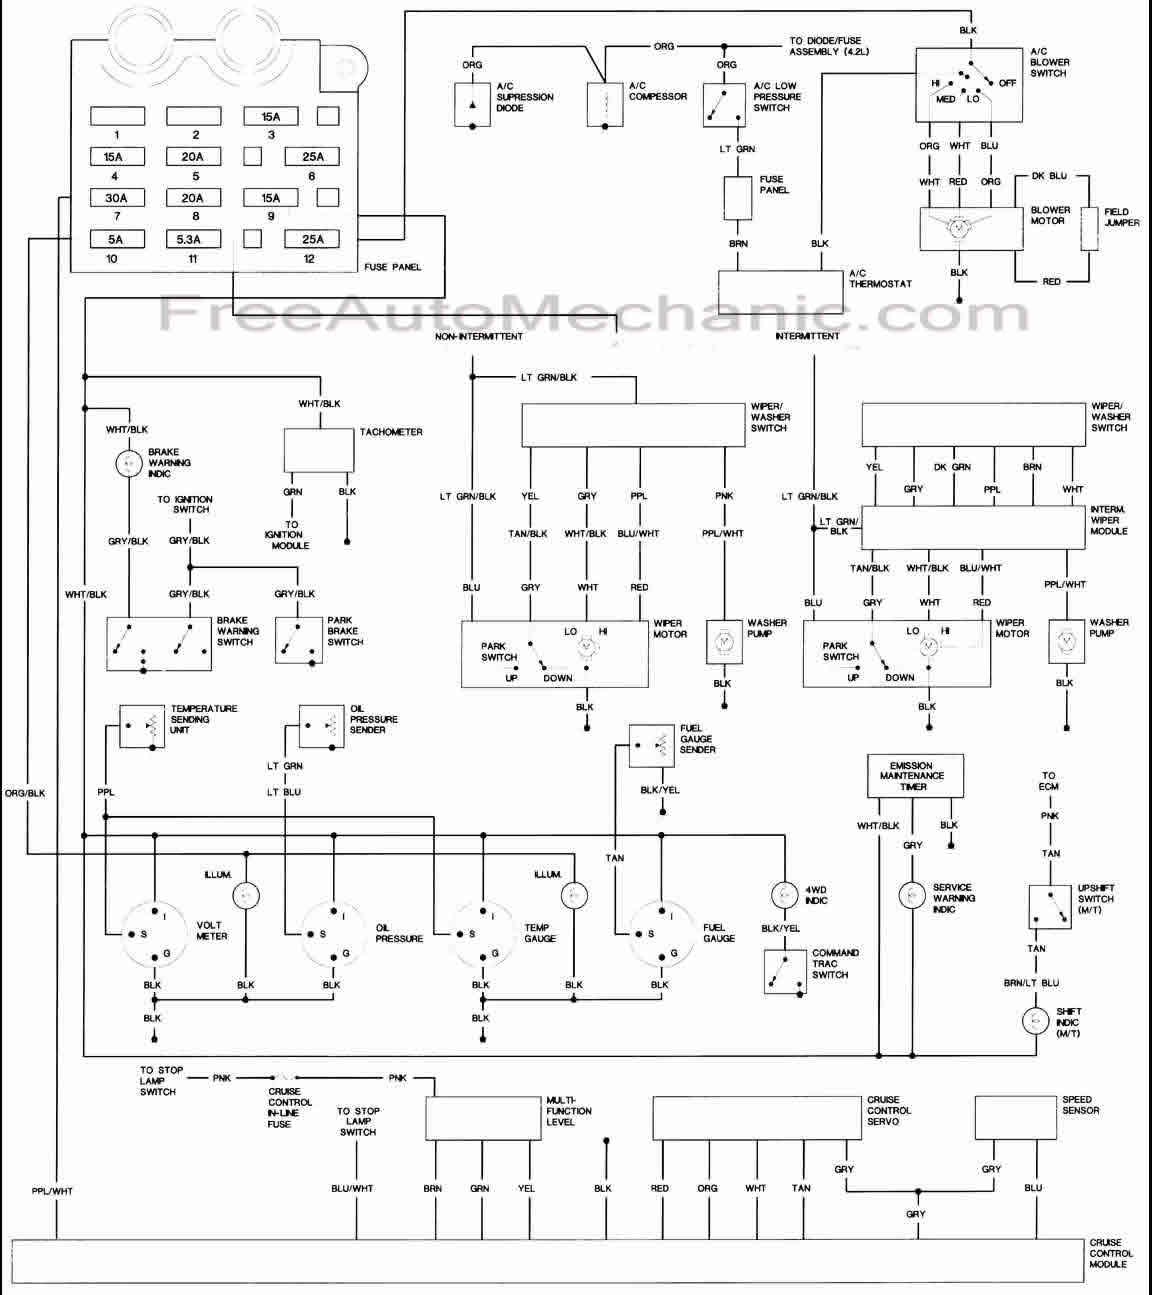 87 jeep wrangler wiring diagram